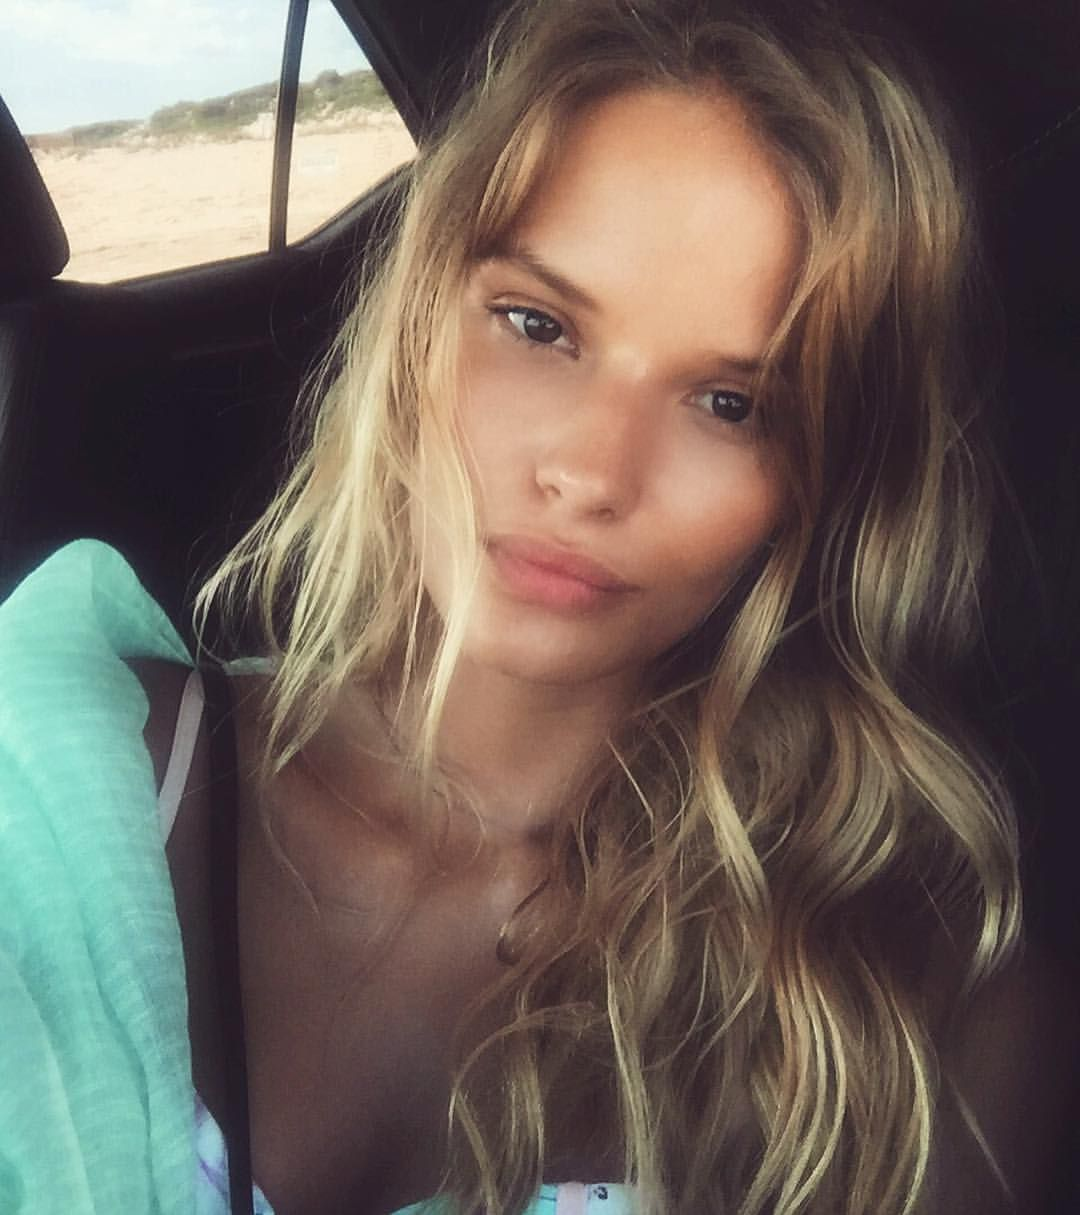 Hacked Alena Blohm nudes (81 photos), Topless, Fappening, Instagram, underwear 2019